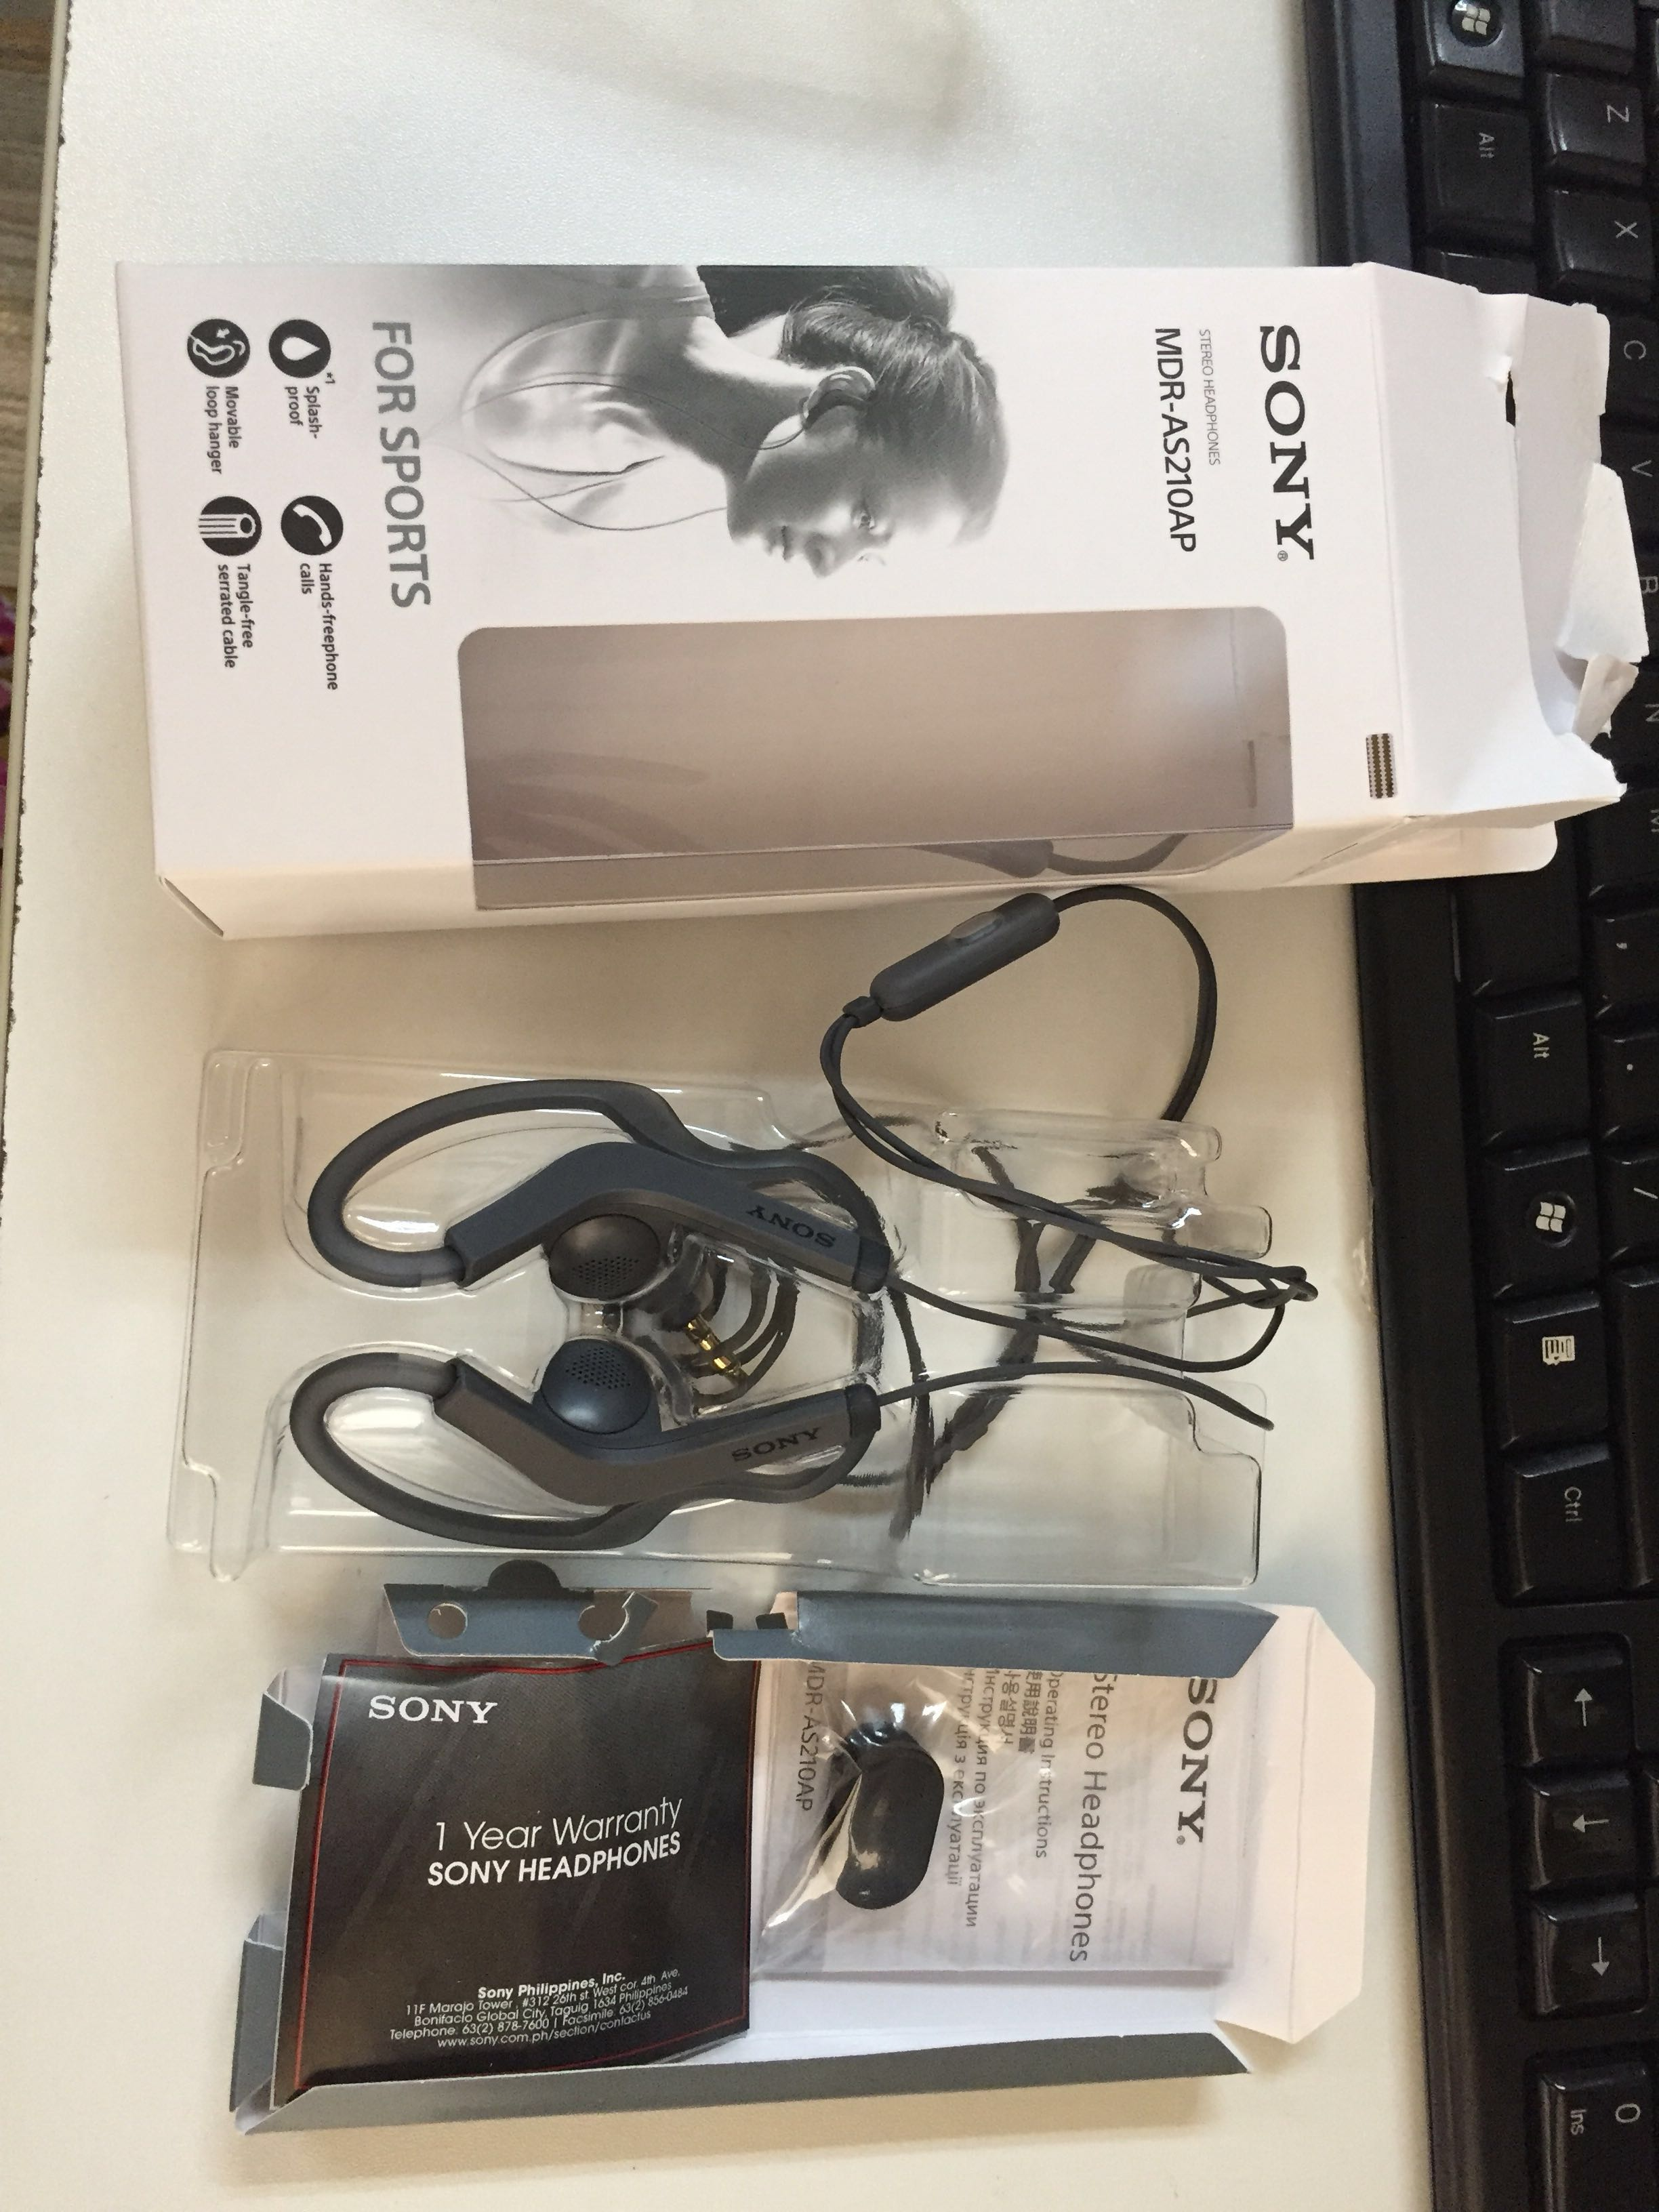 Original Sonny Headset or headphones